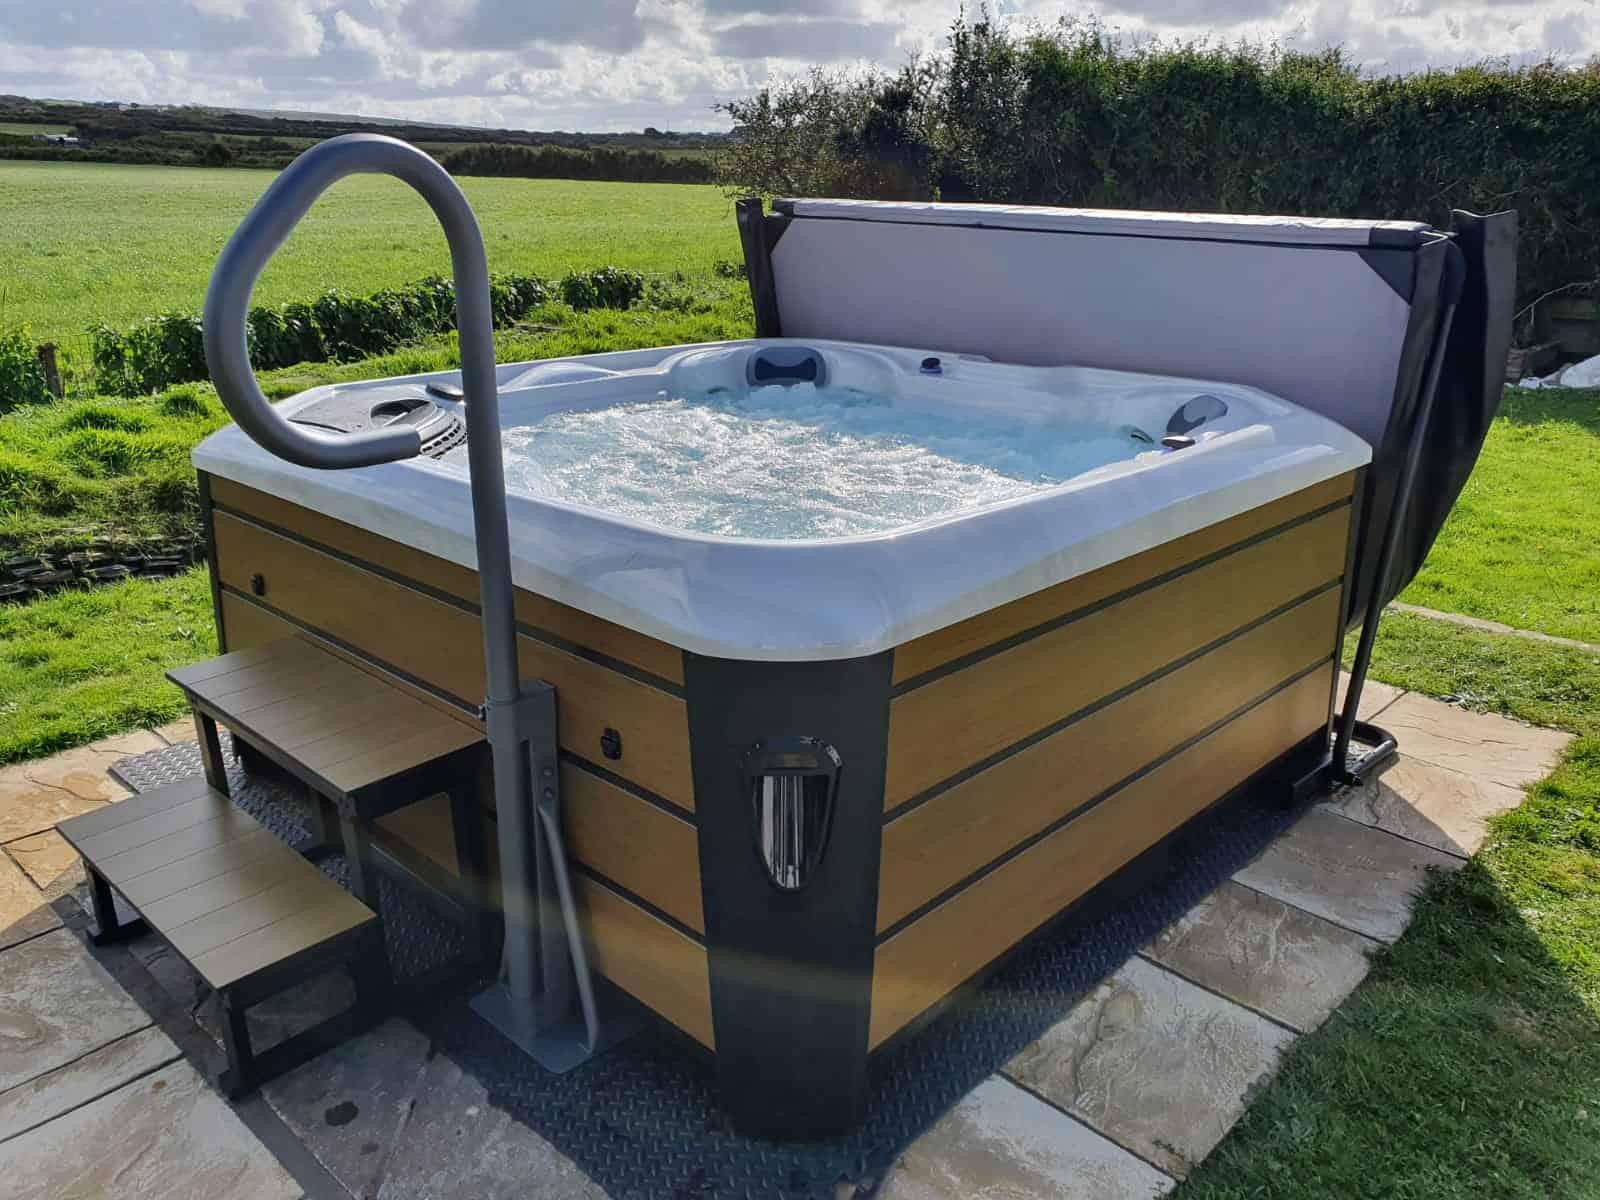 Santorini hot tub